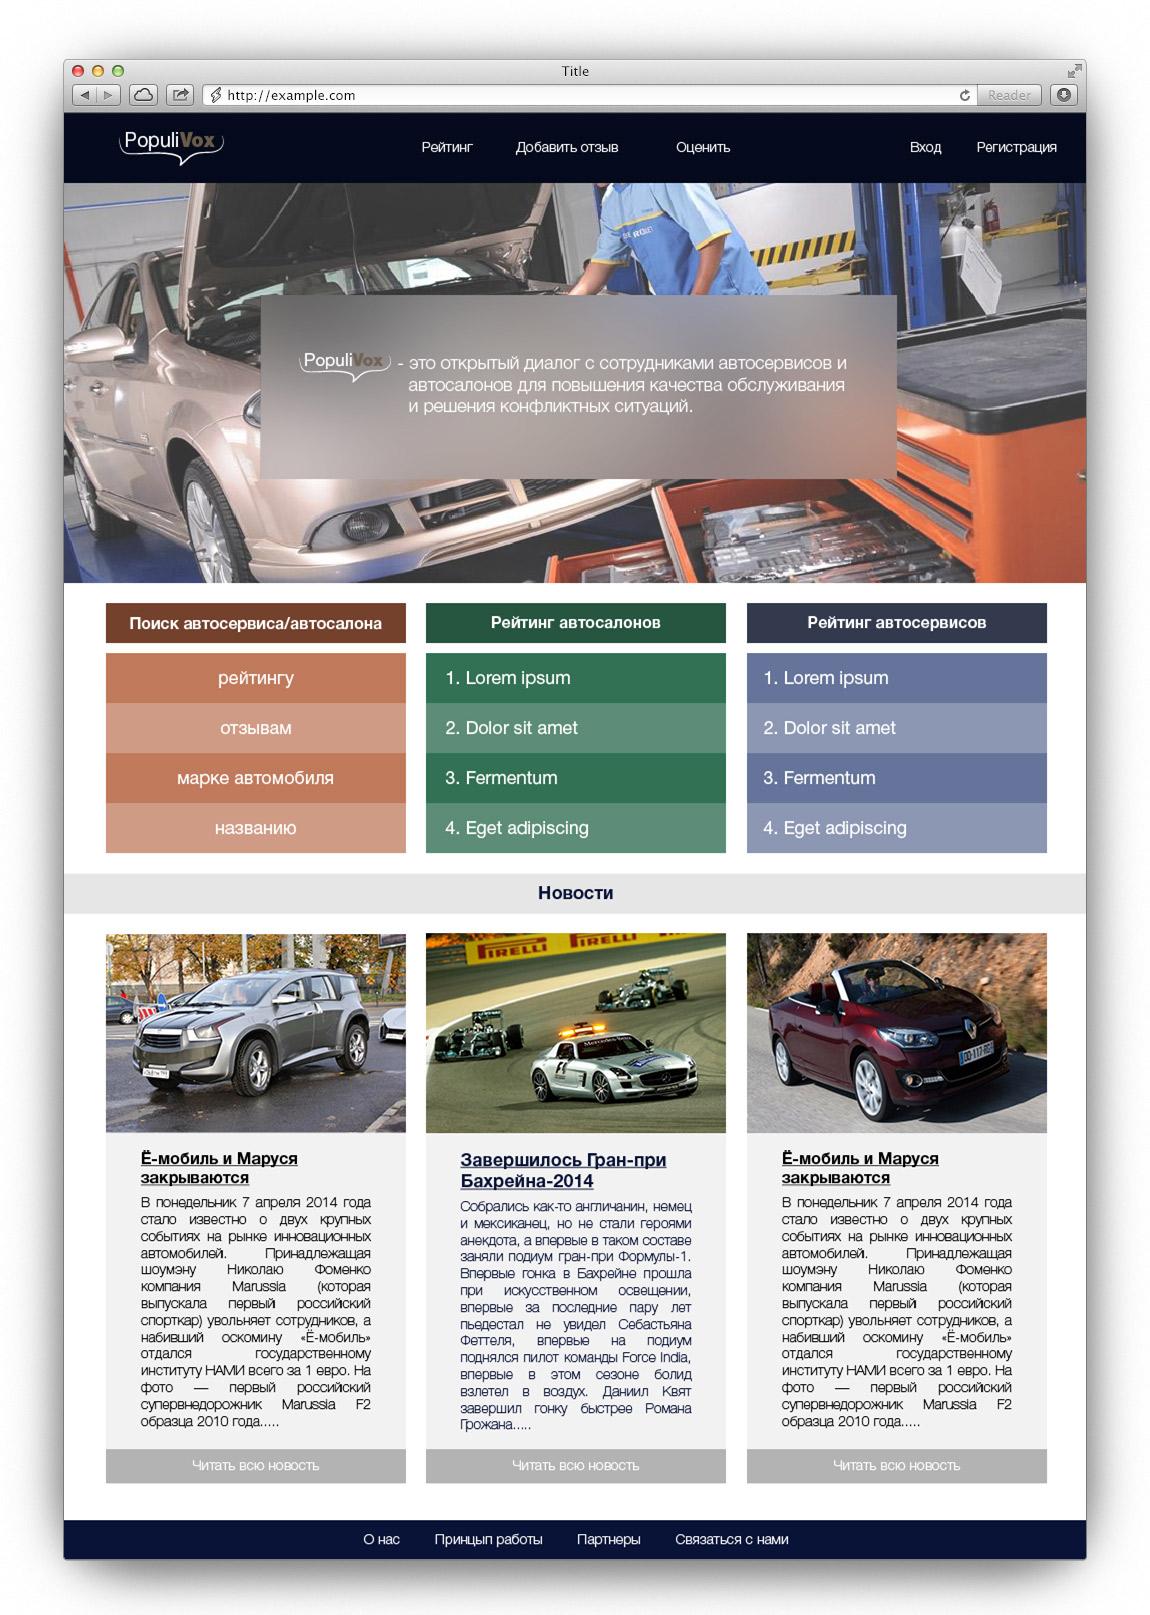 Разработка дизайна сайта и фирменного стиля фото f_1075342bceb202b1.jpg